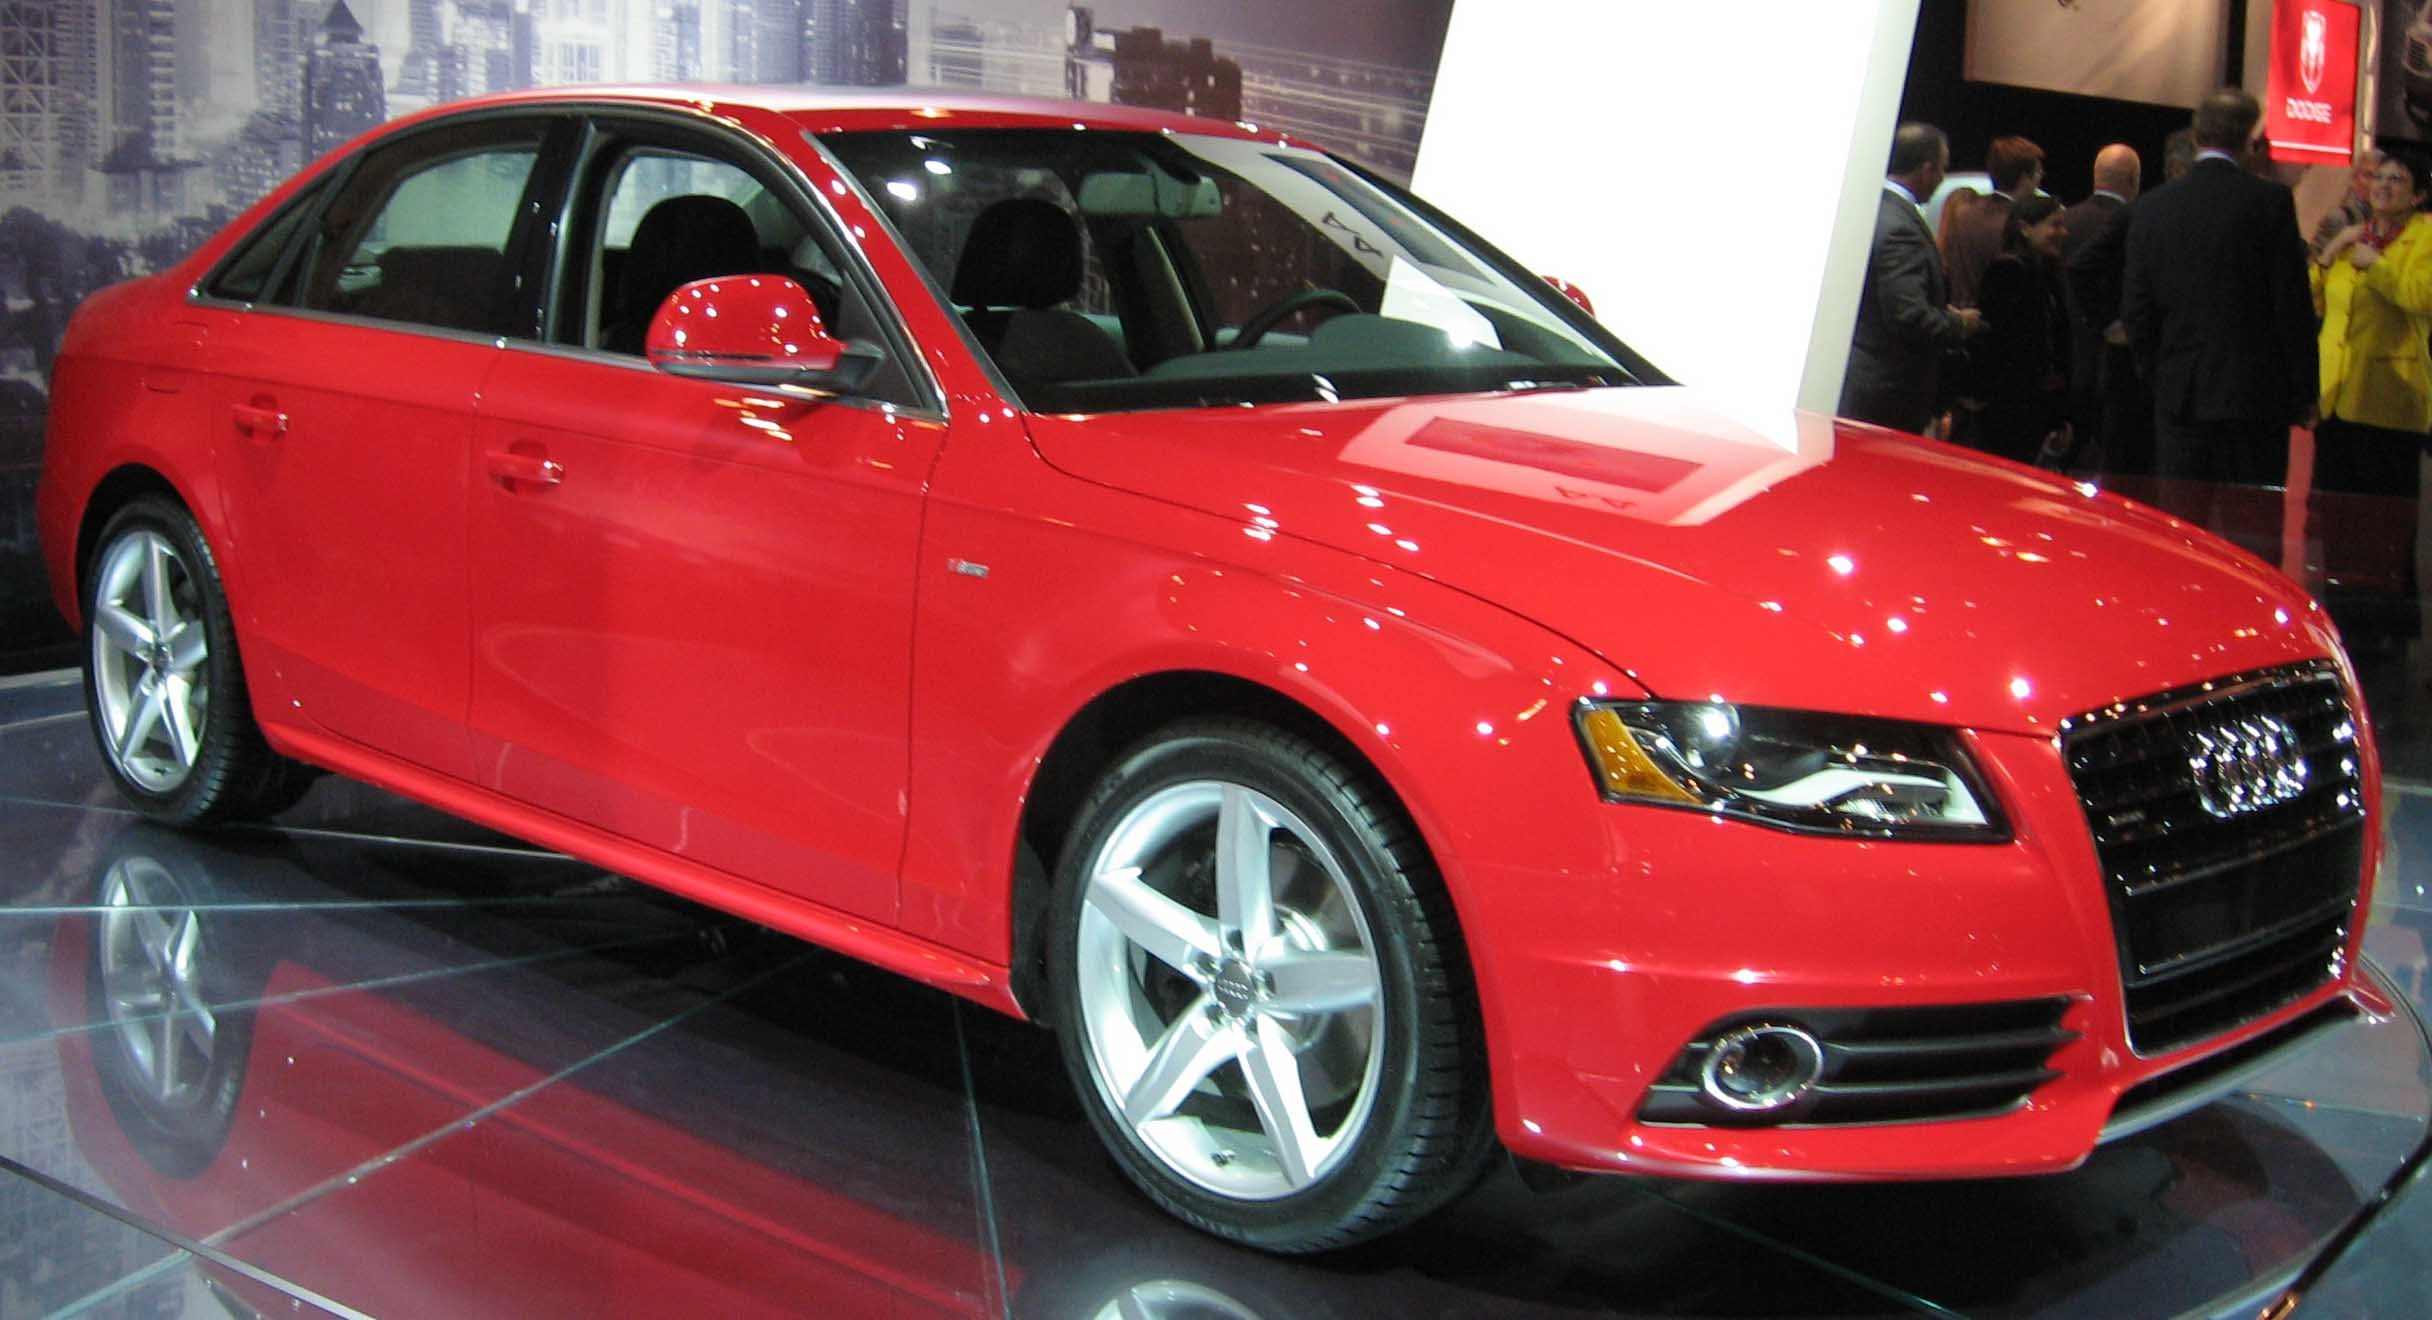 File:2009 Audi A4 sedan NY.jpg - Wikimedia Commons